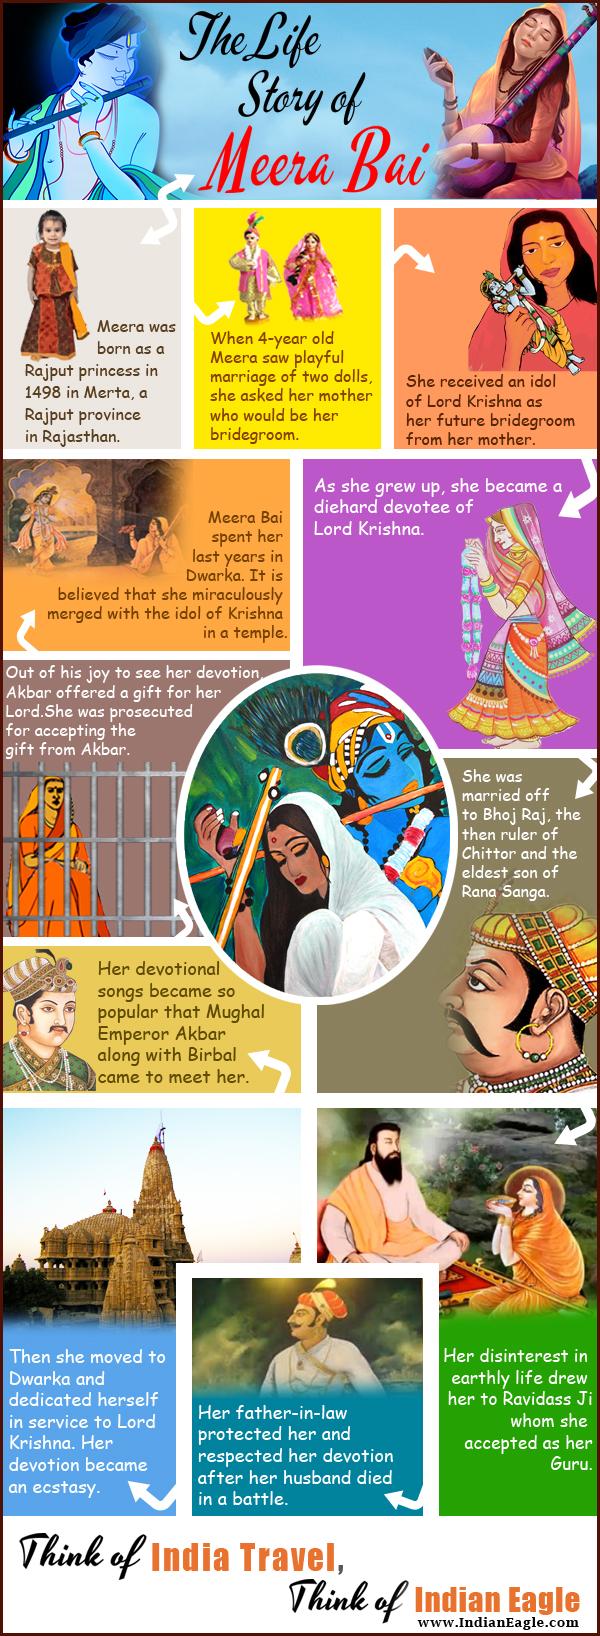 meerabai biography, meerabai life story, meerabai bhajans, Rajasthan, interesting facts, love stories of India, Indian Eagle travel